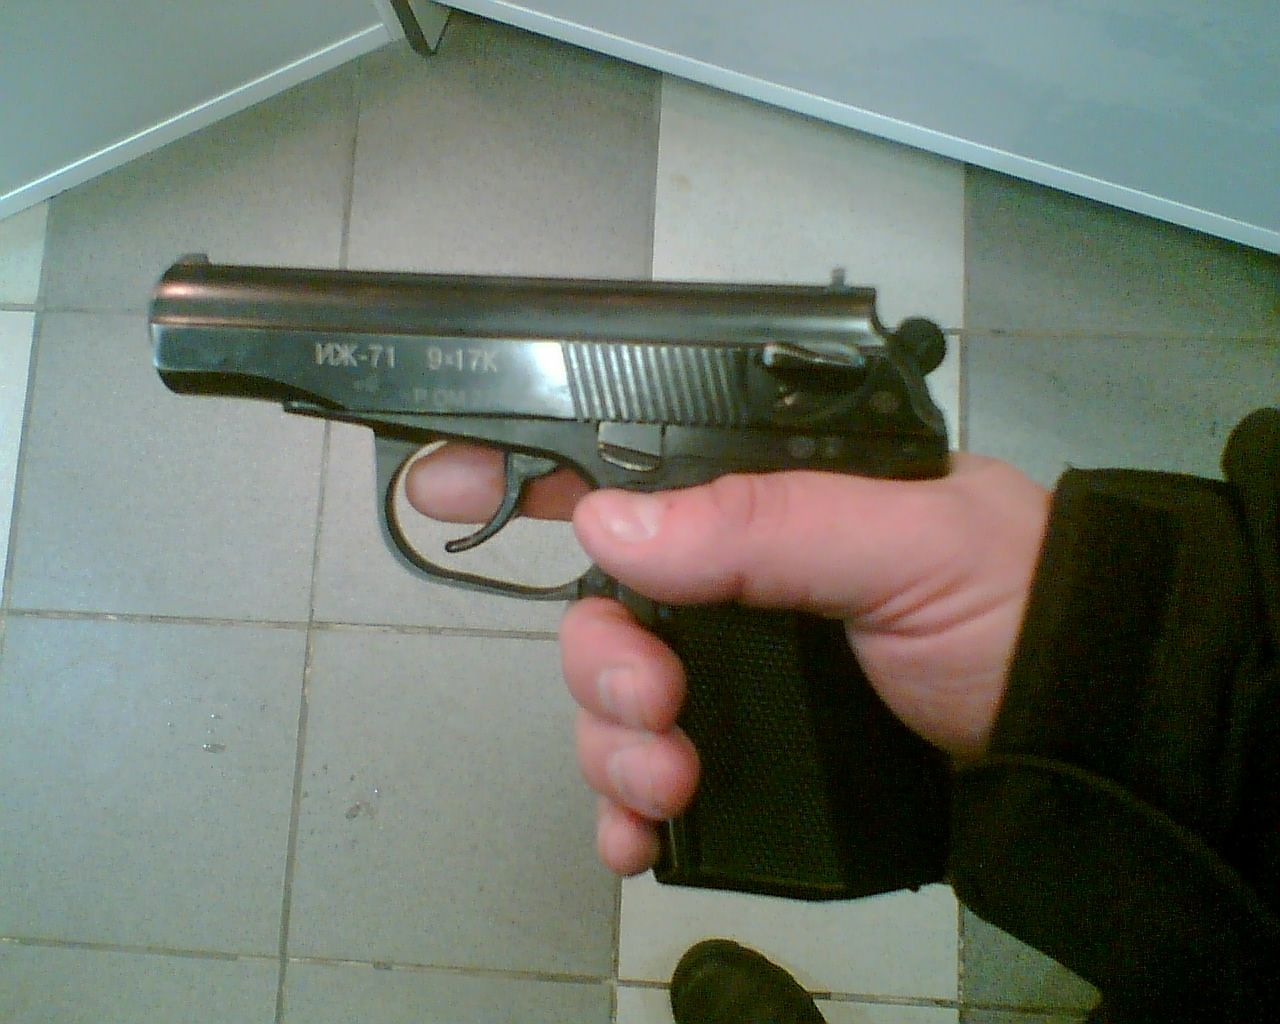 ИЖ-71 в руках